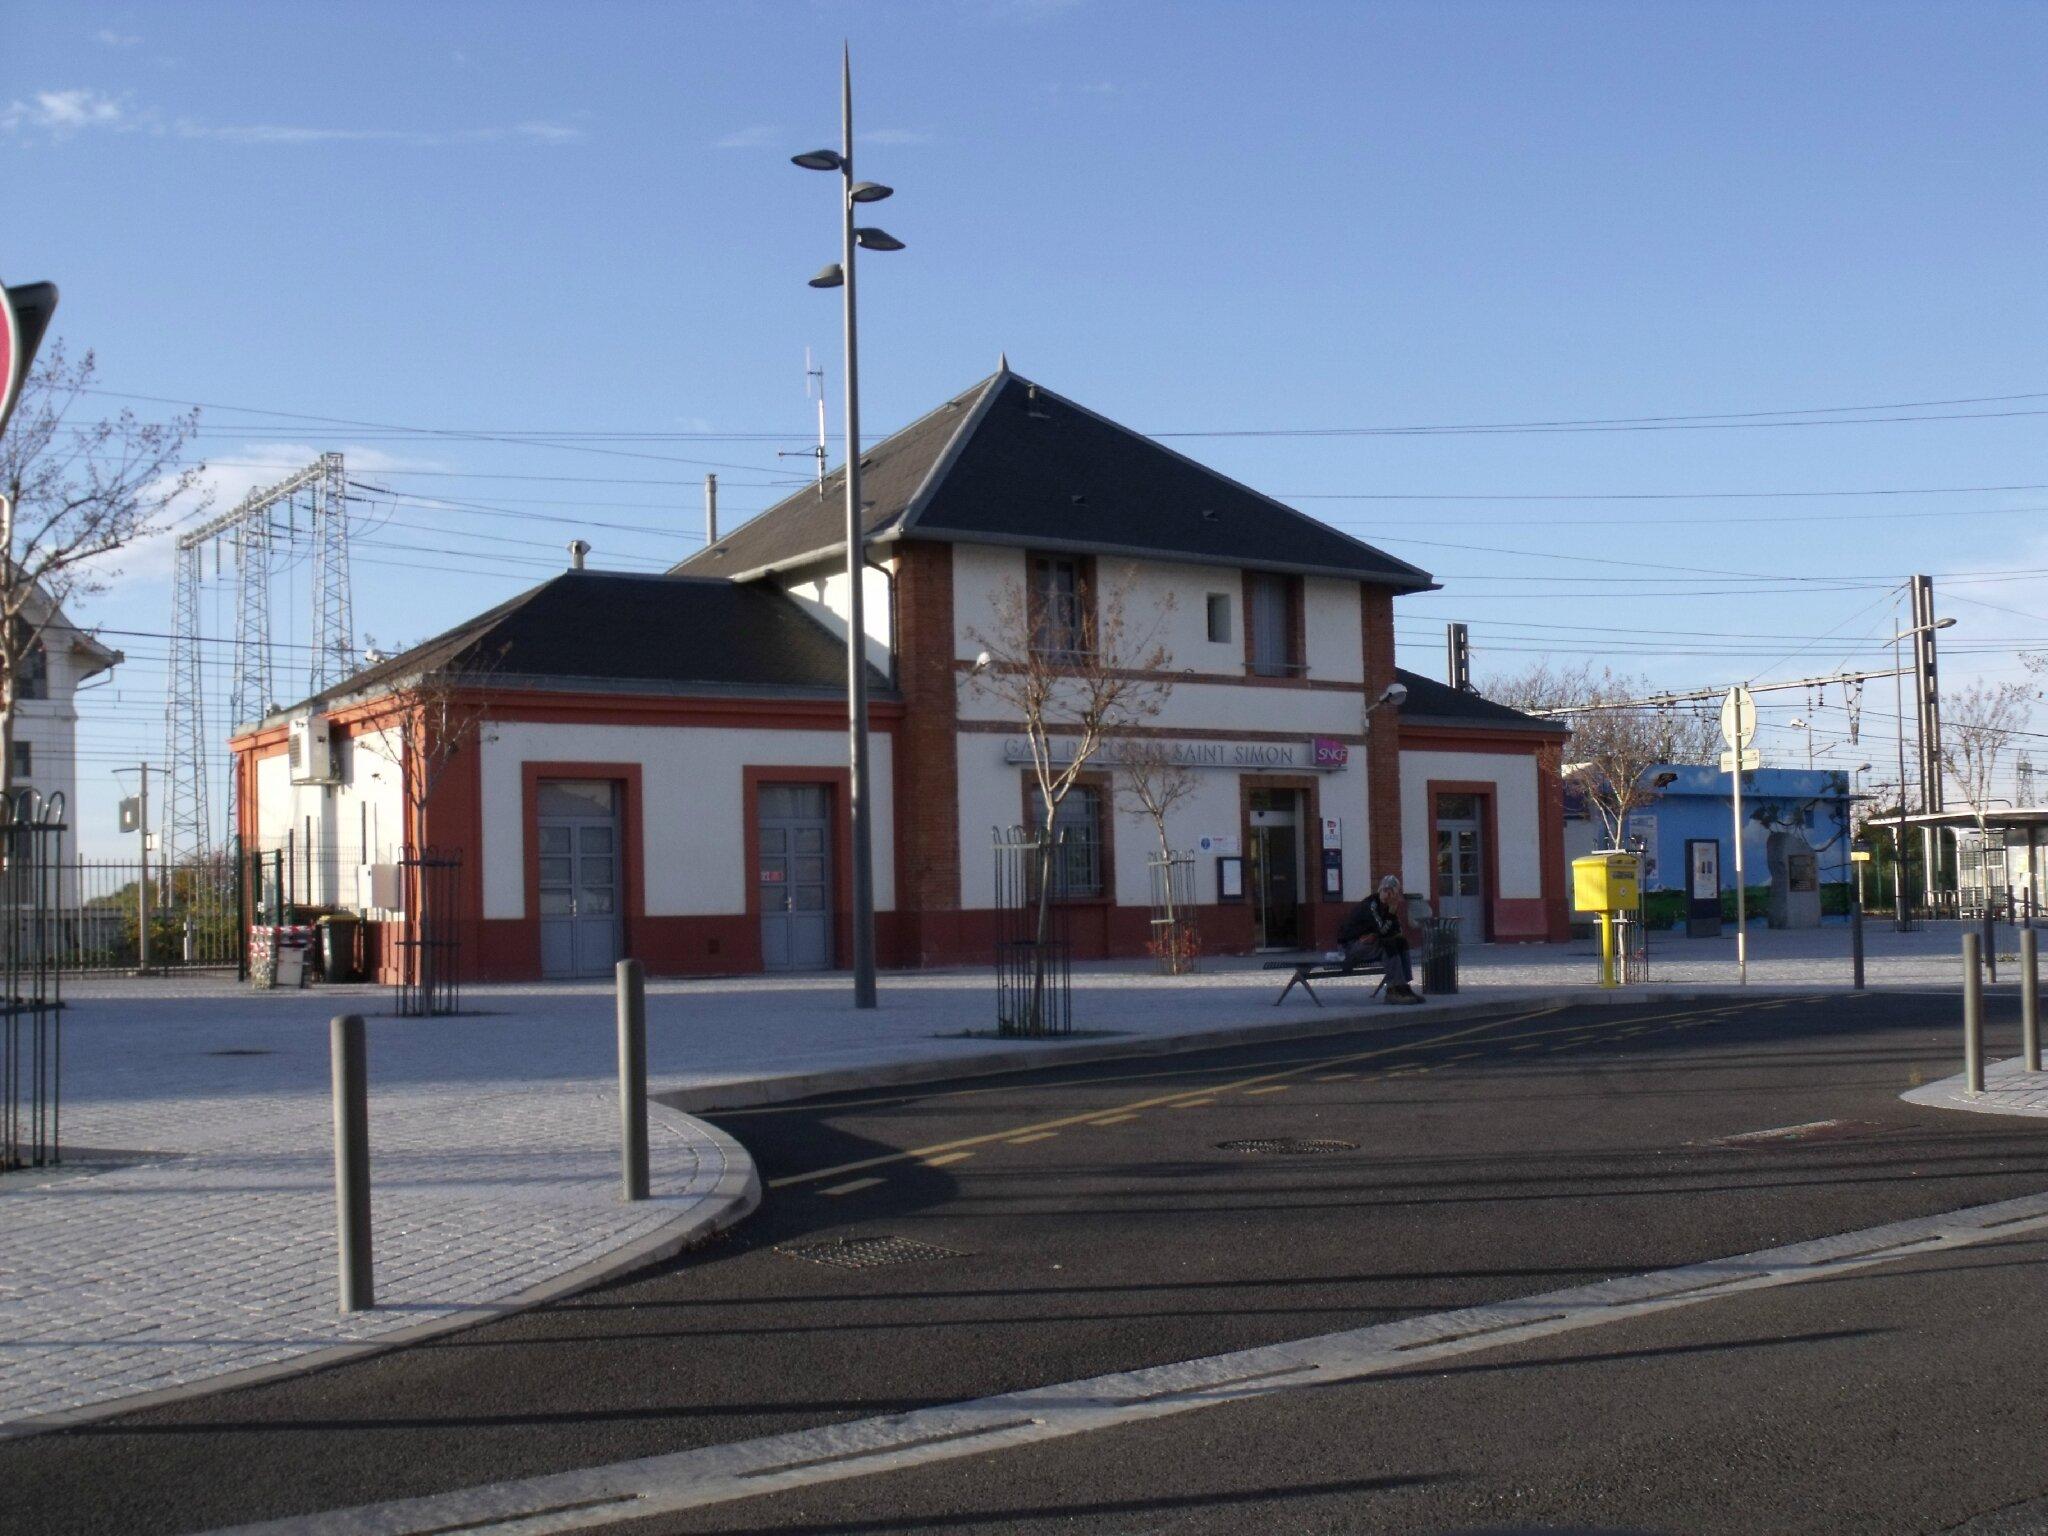 Portet-Saint-Simon (Haute-Garonne - 31)